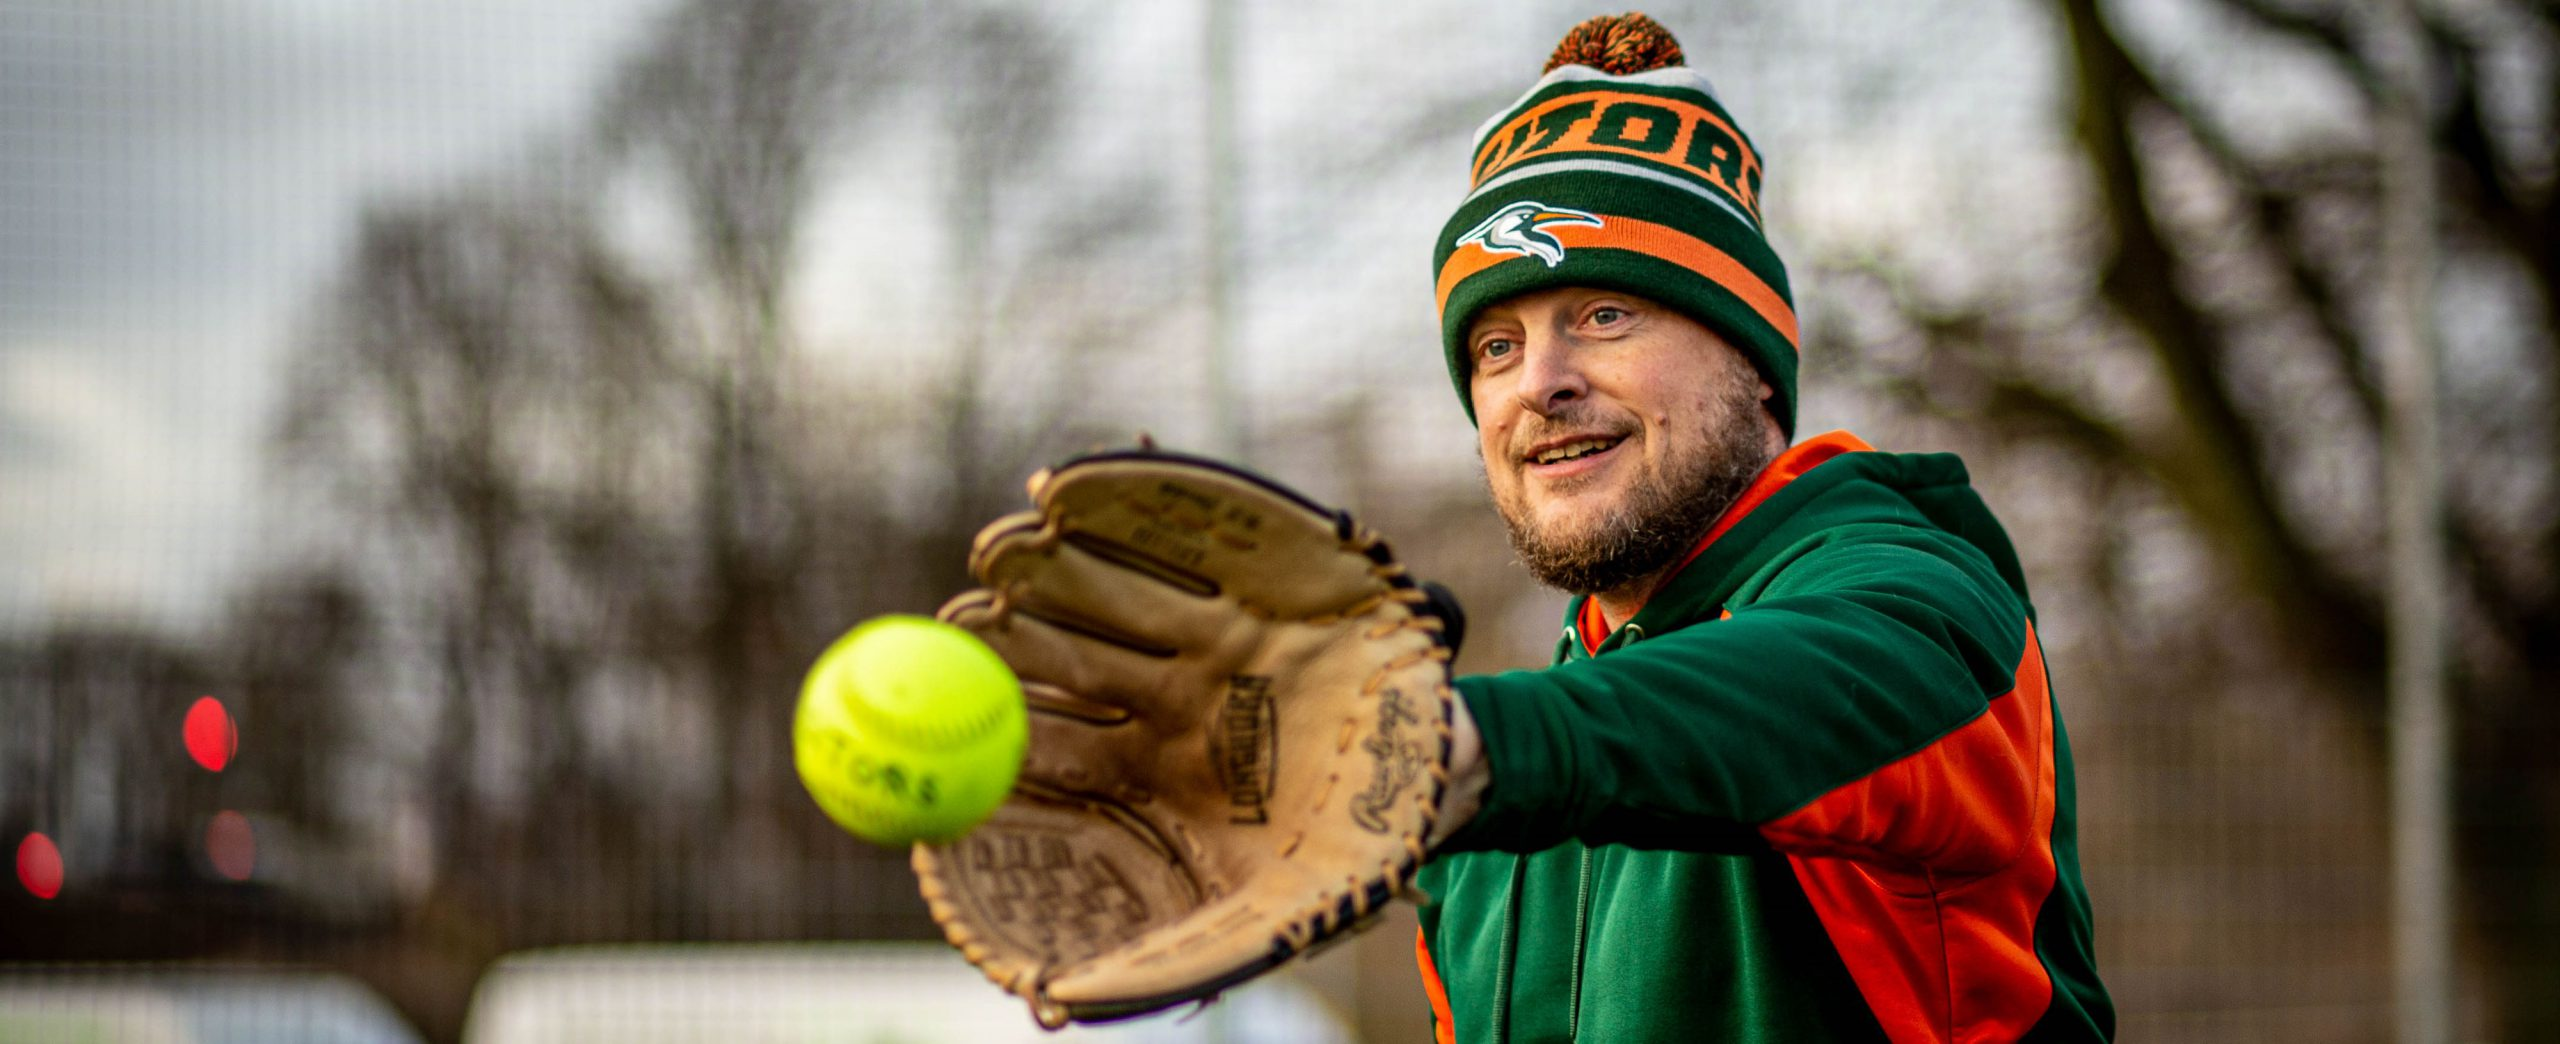 Mütze Softball Kopf